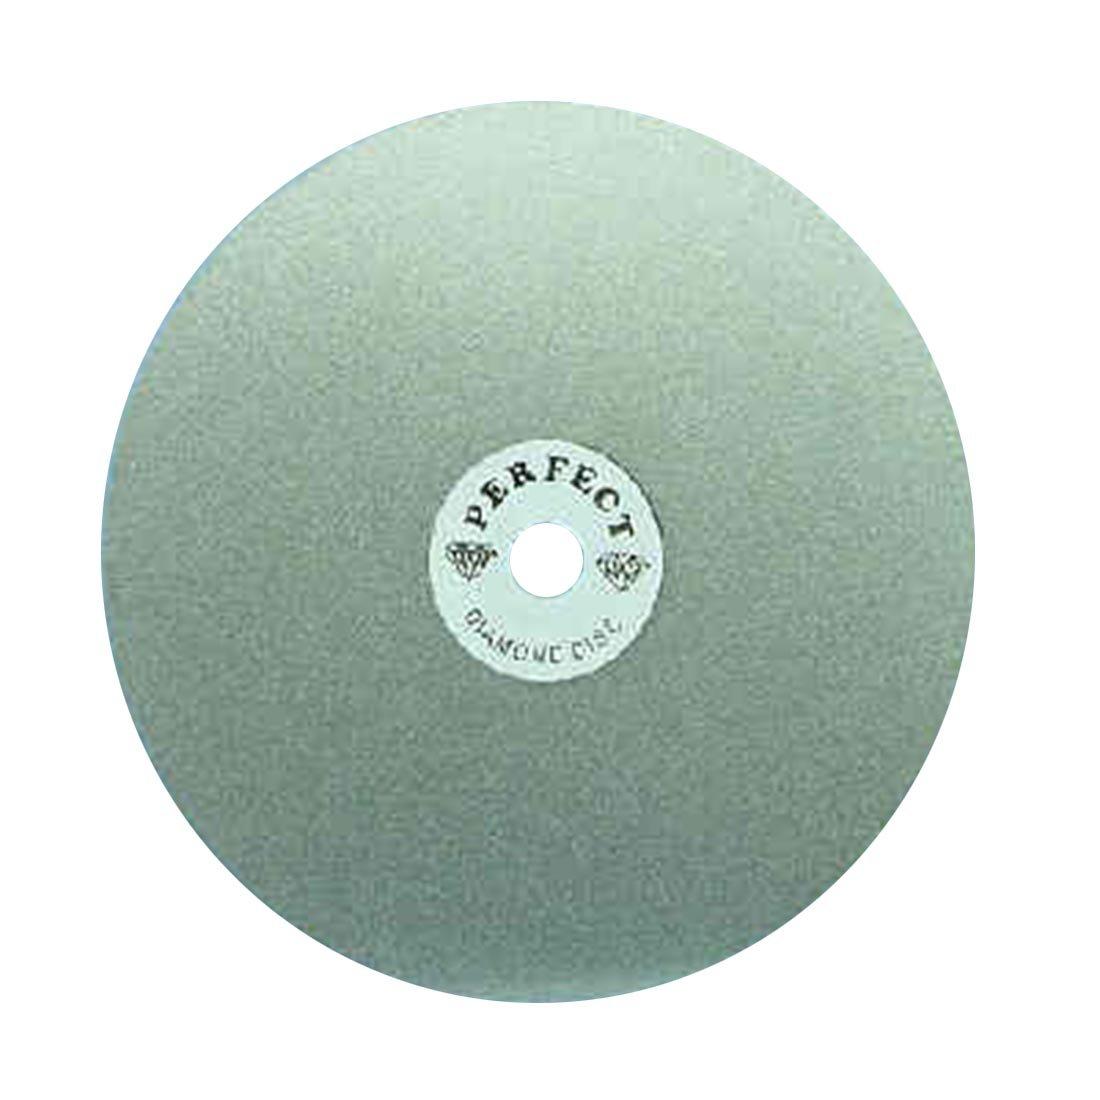 6 x 1800 Grit Diamond Lapidary Sachi Perfect Faceting Rock Polishing Flat Lap BUTW